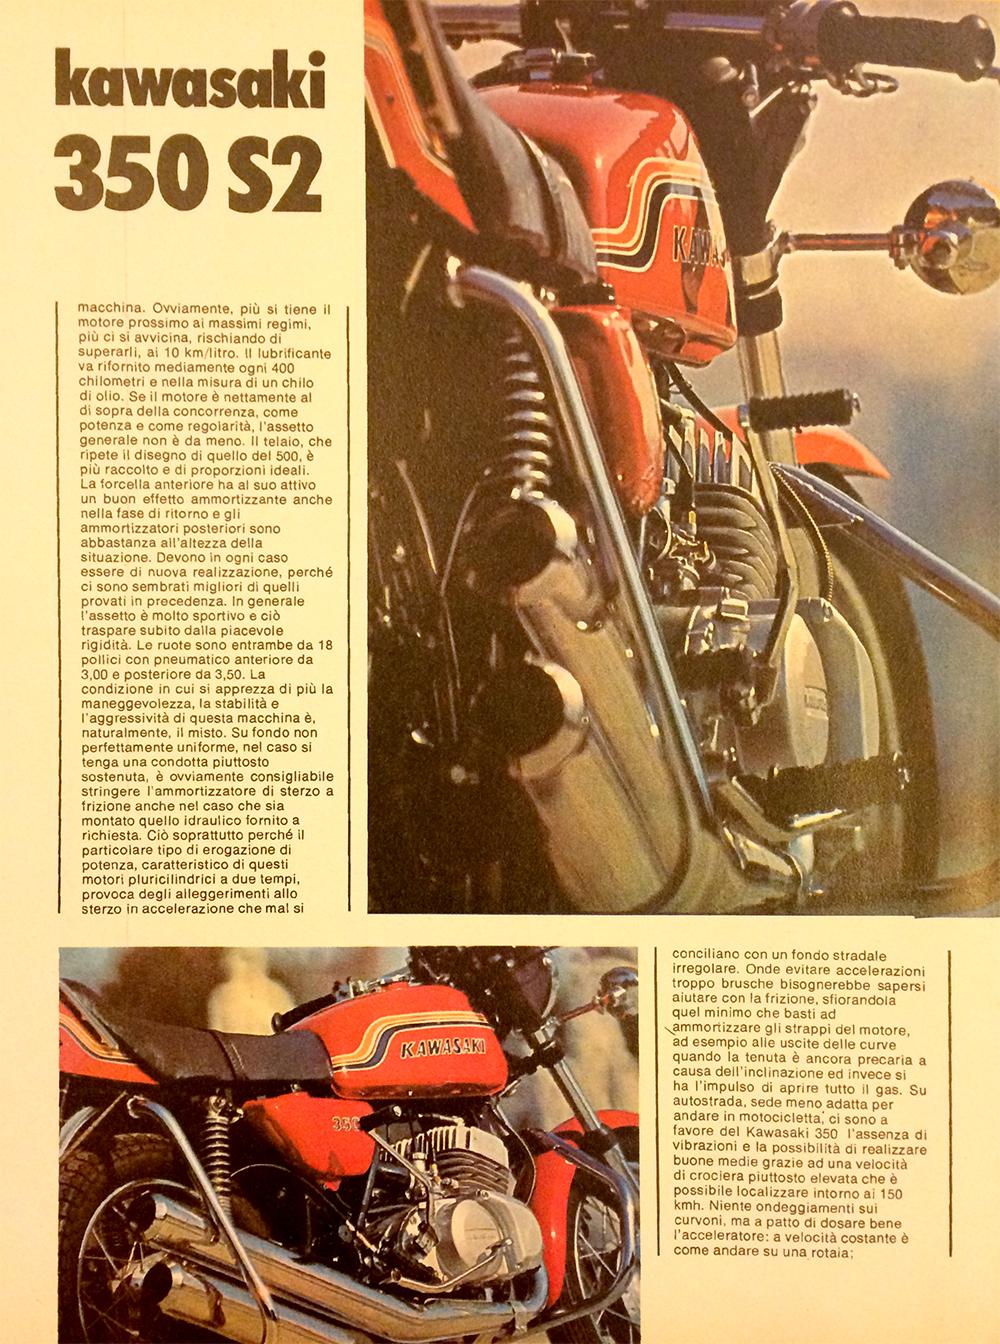 1971 Kawasaki 350 S2 Italy road test 10.jpg